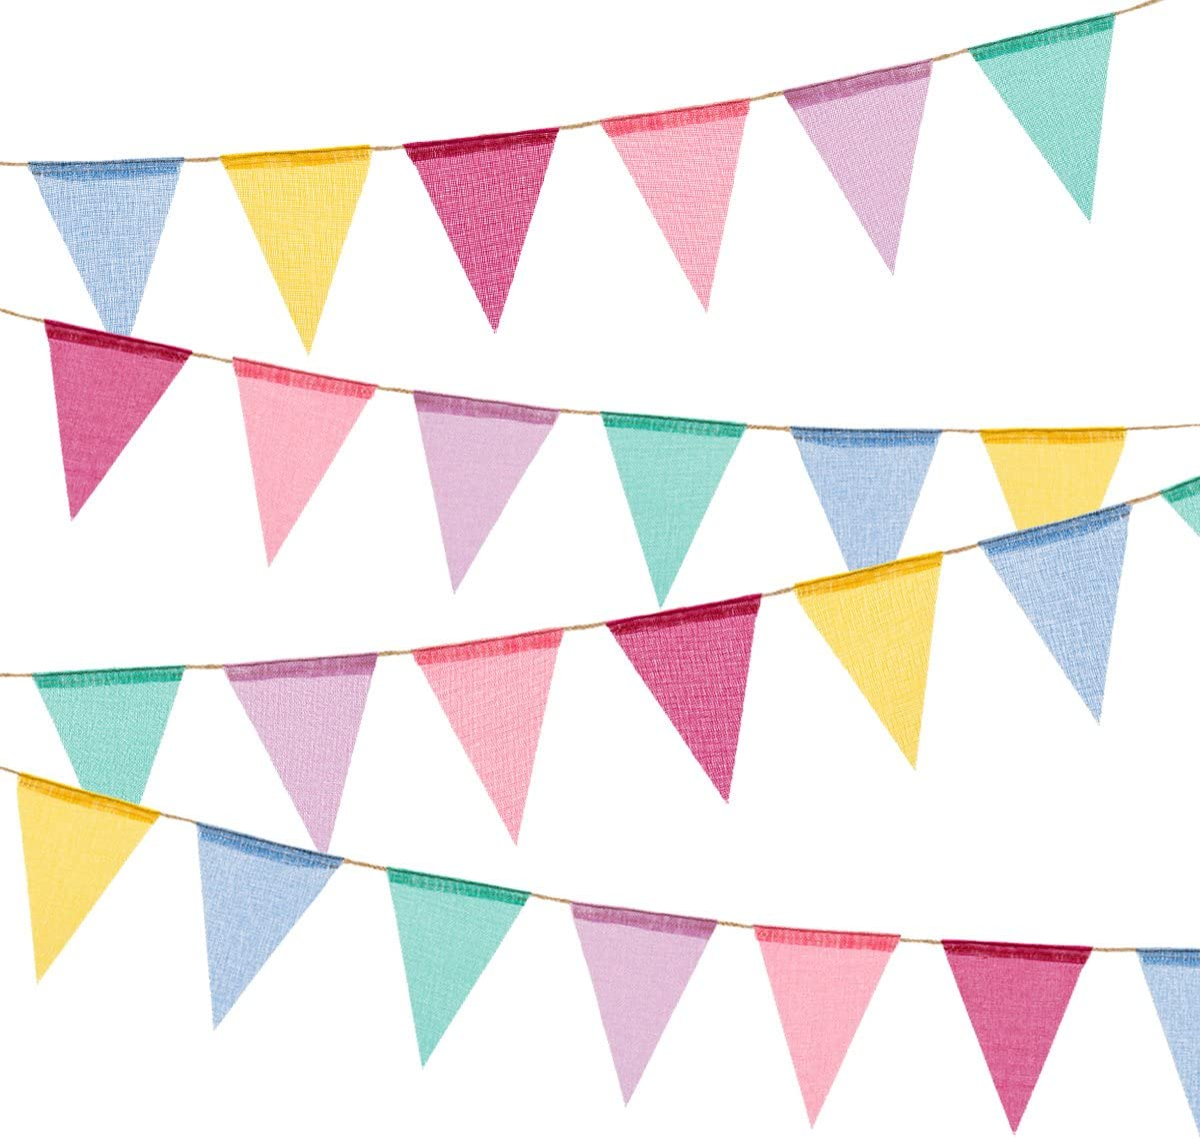 BEFORYOU 36 Flags Imitated Burlap Pennant Banner - Multicolor Fa